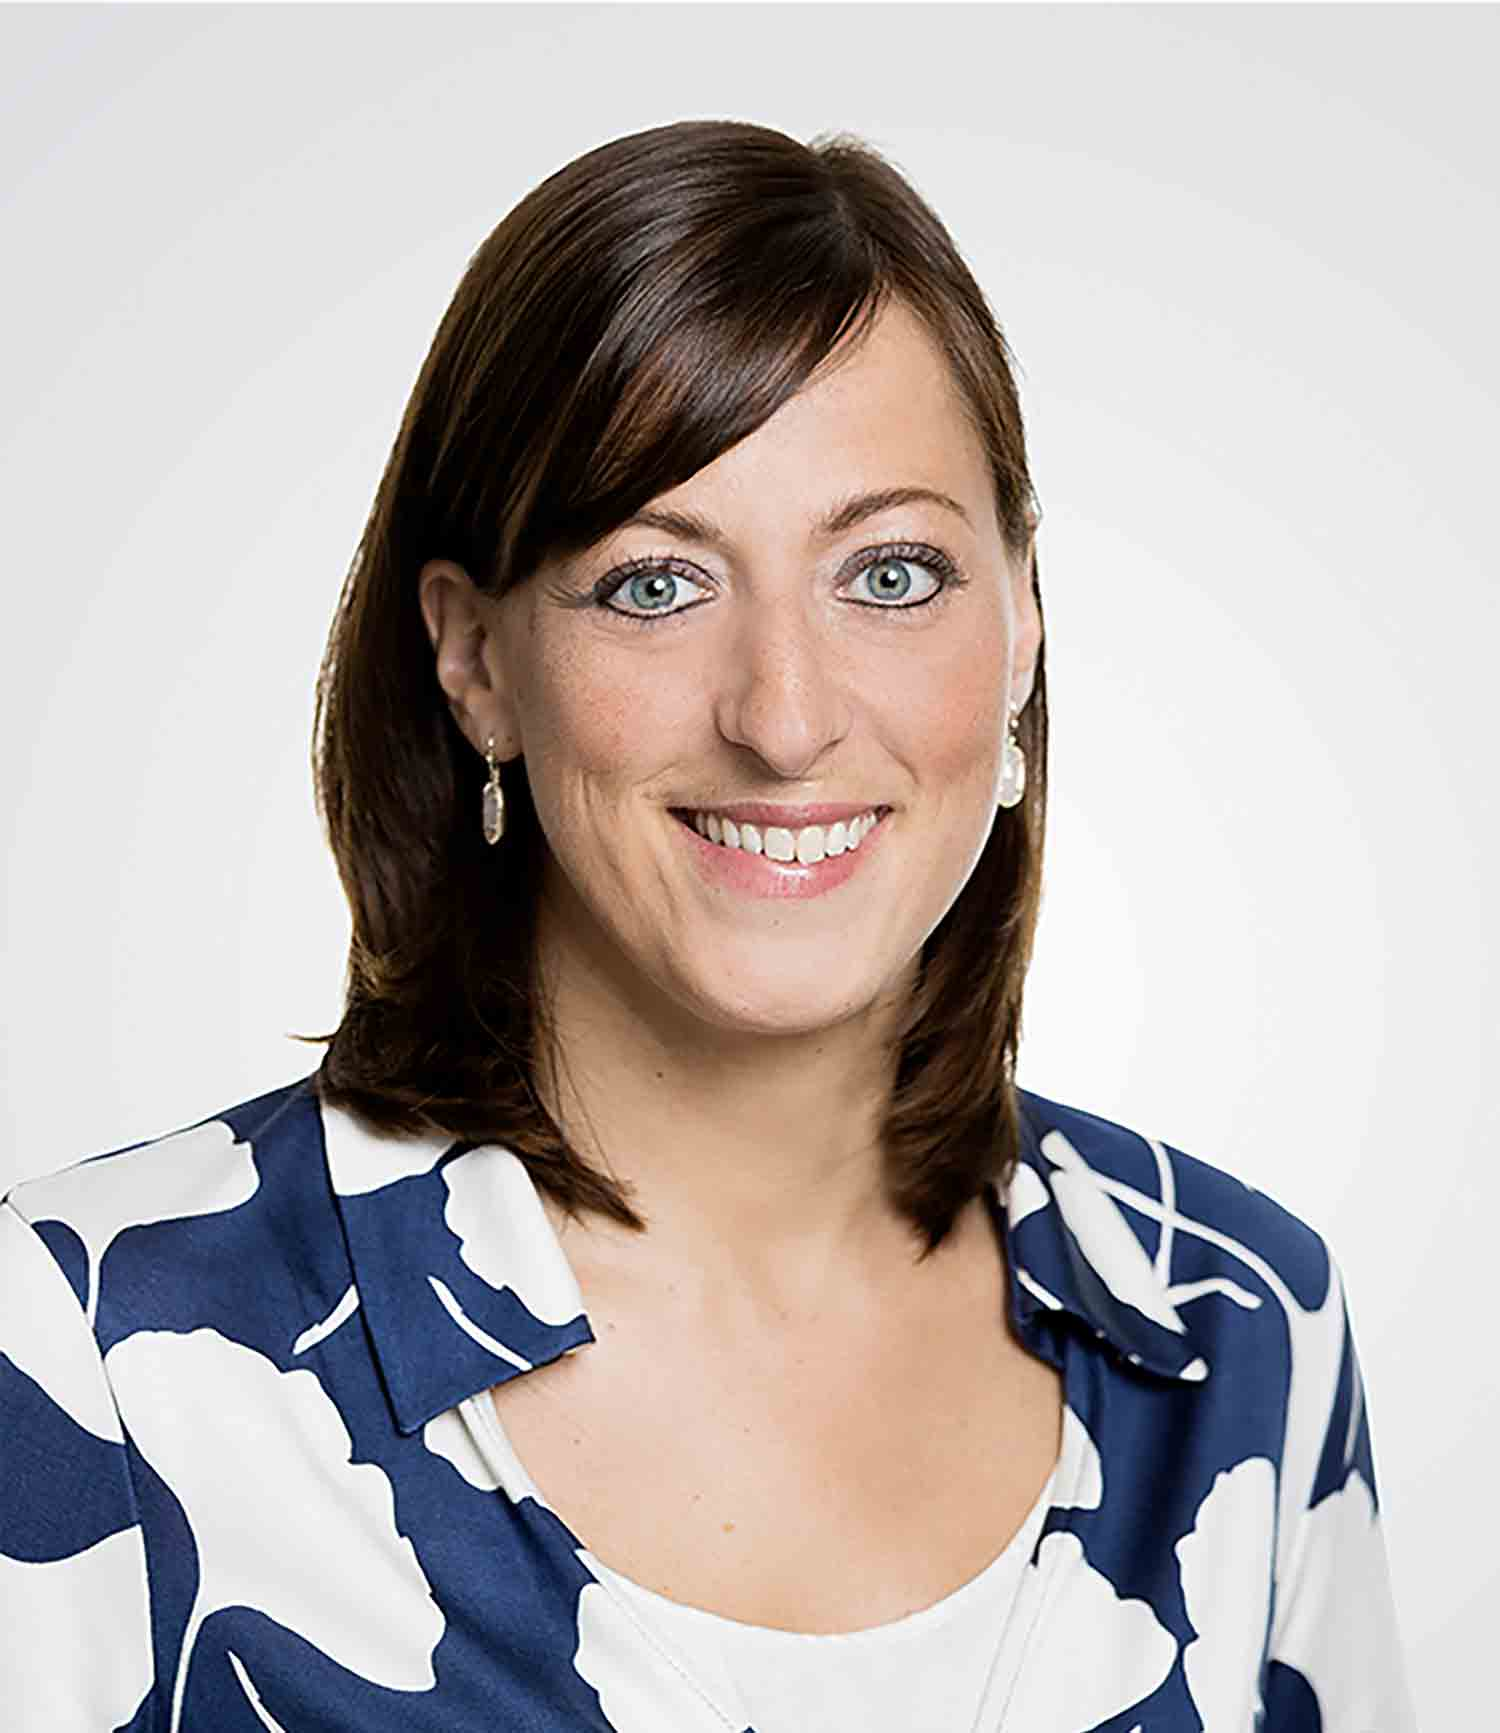 Carla Editha Högermann